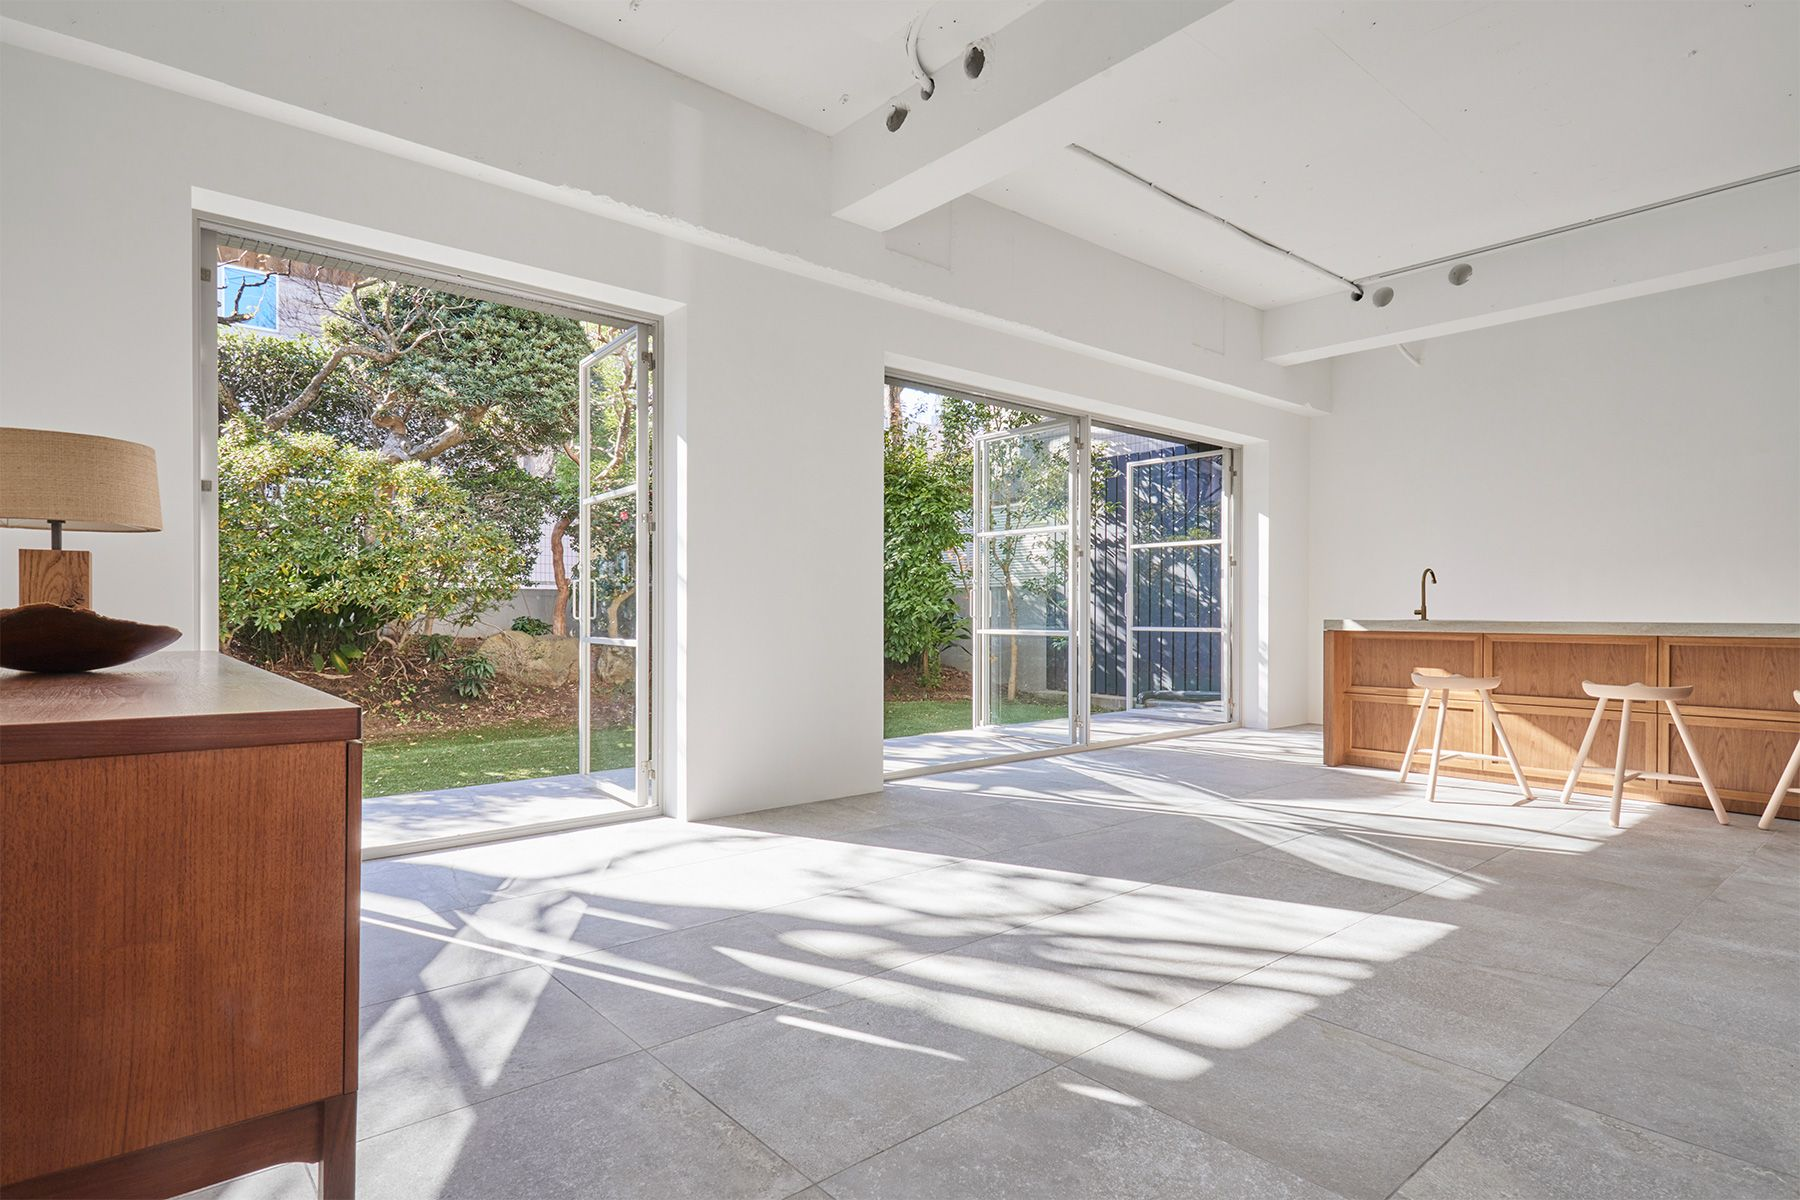 Haku Studio / THE HOUSE (ハクスタジオ)開放的な外へと繋がる床